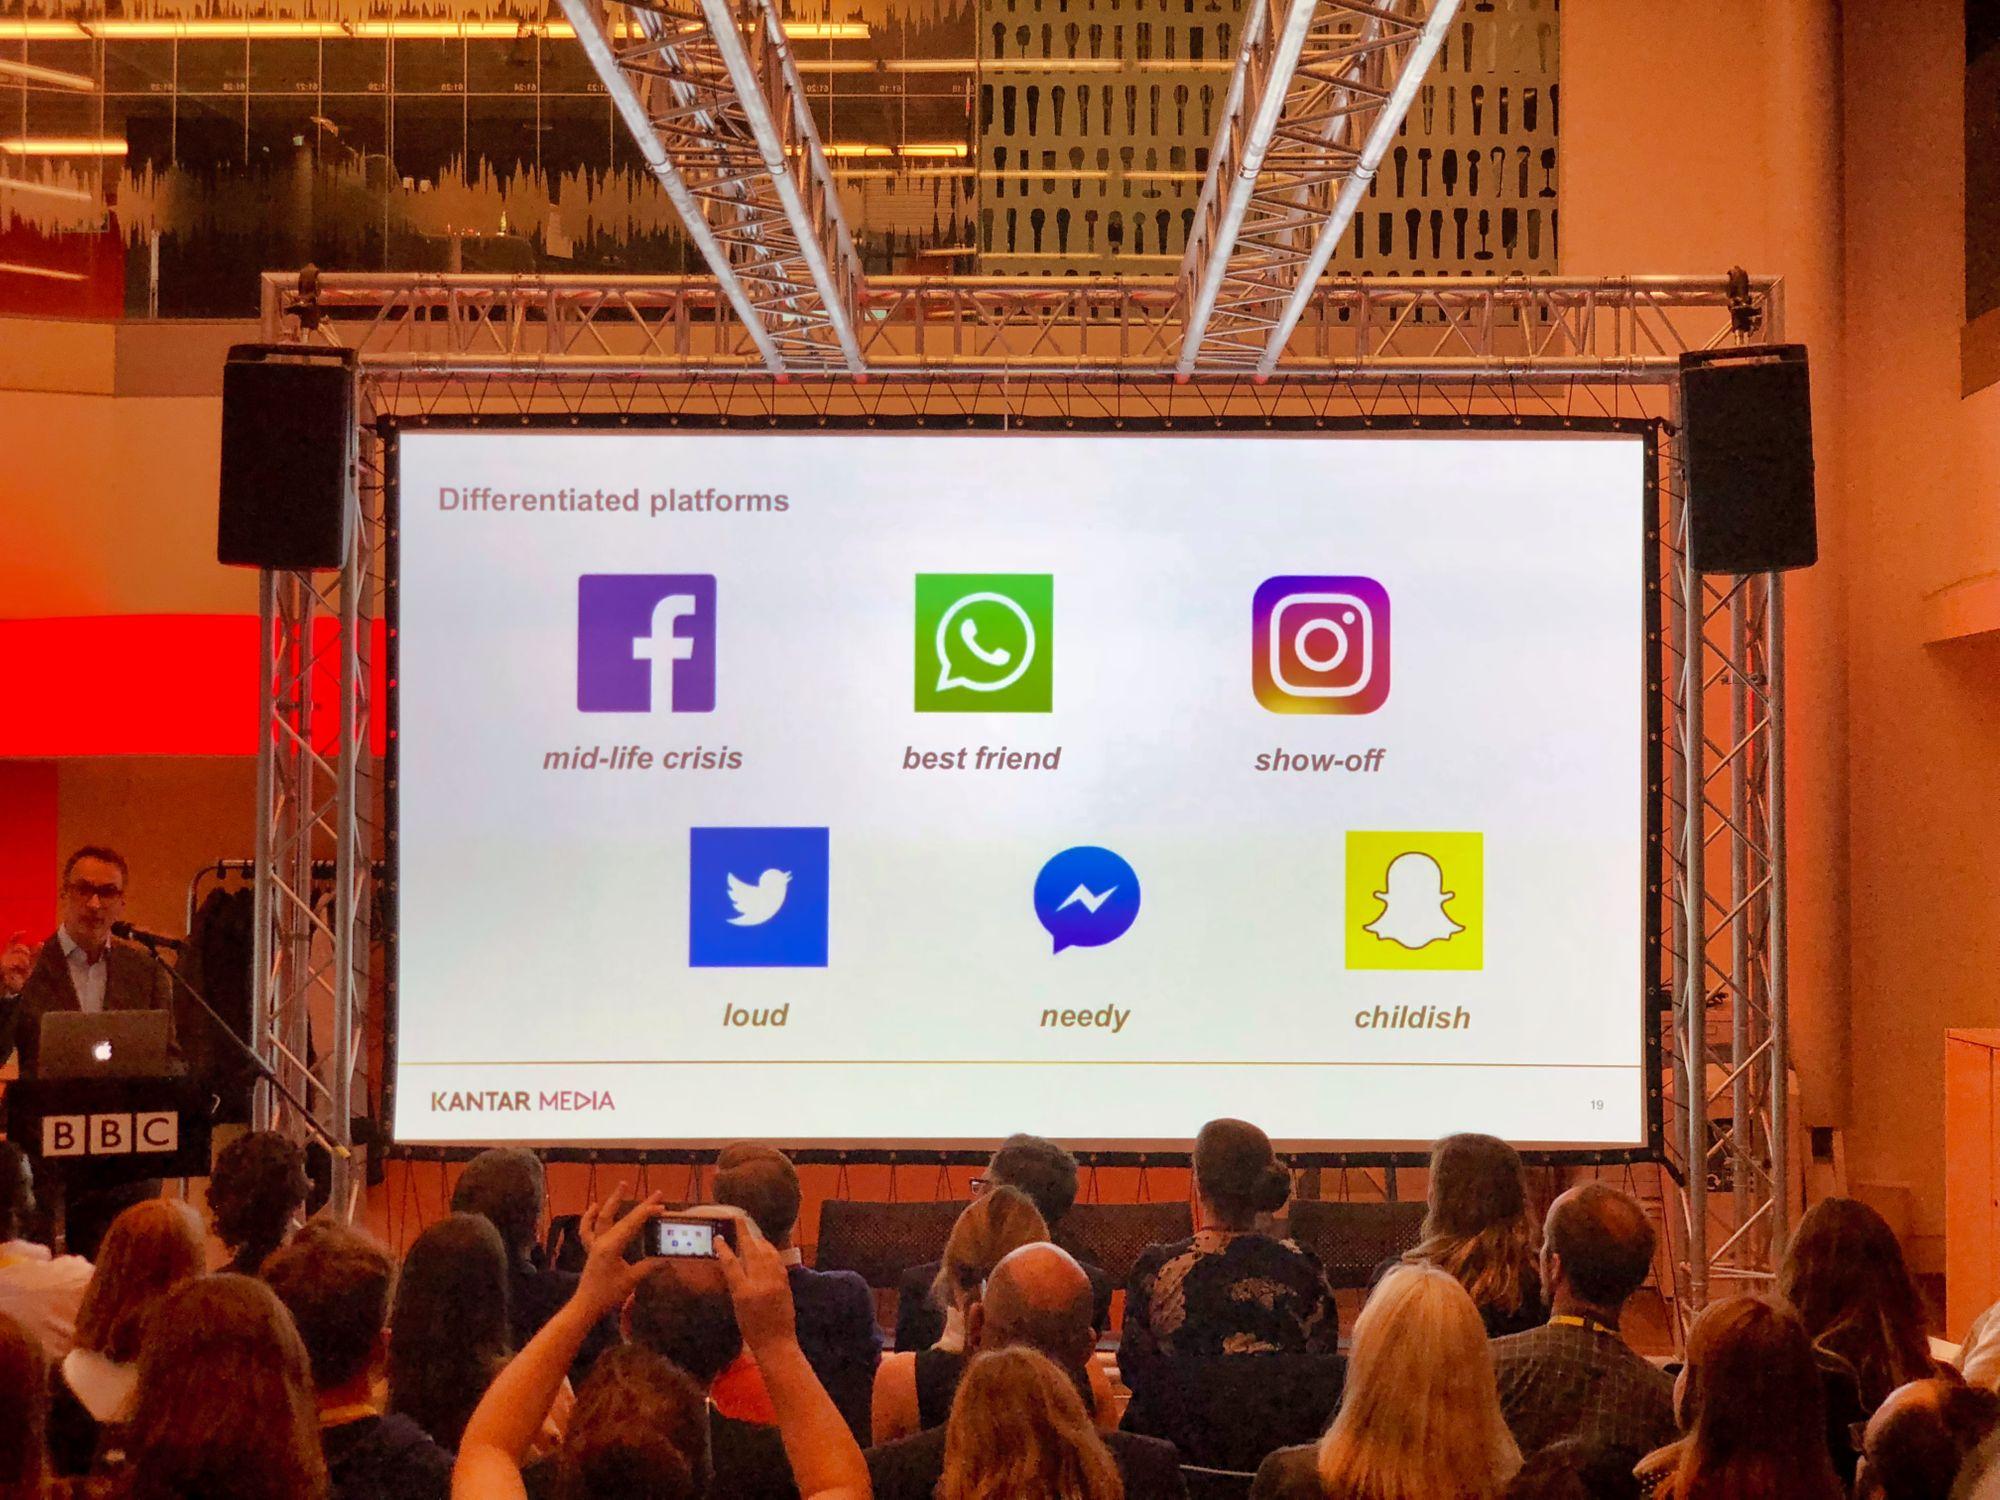 Perceptions of social media services